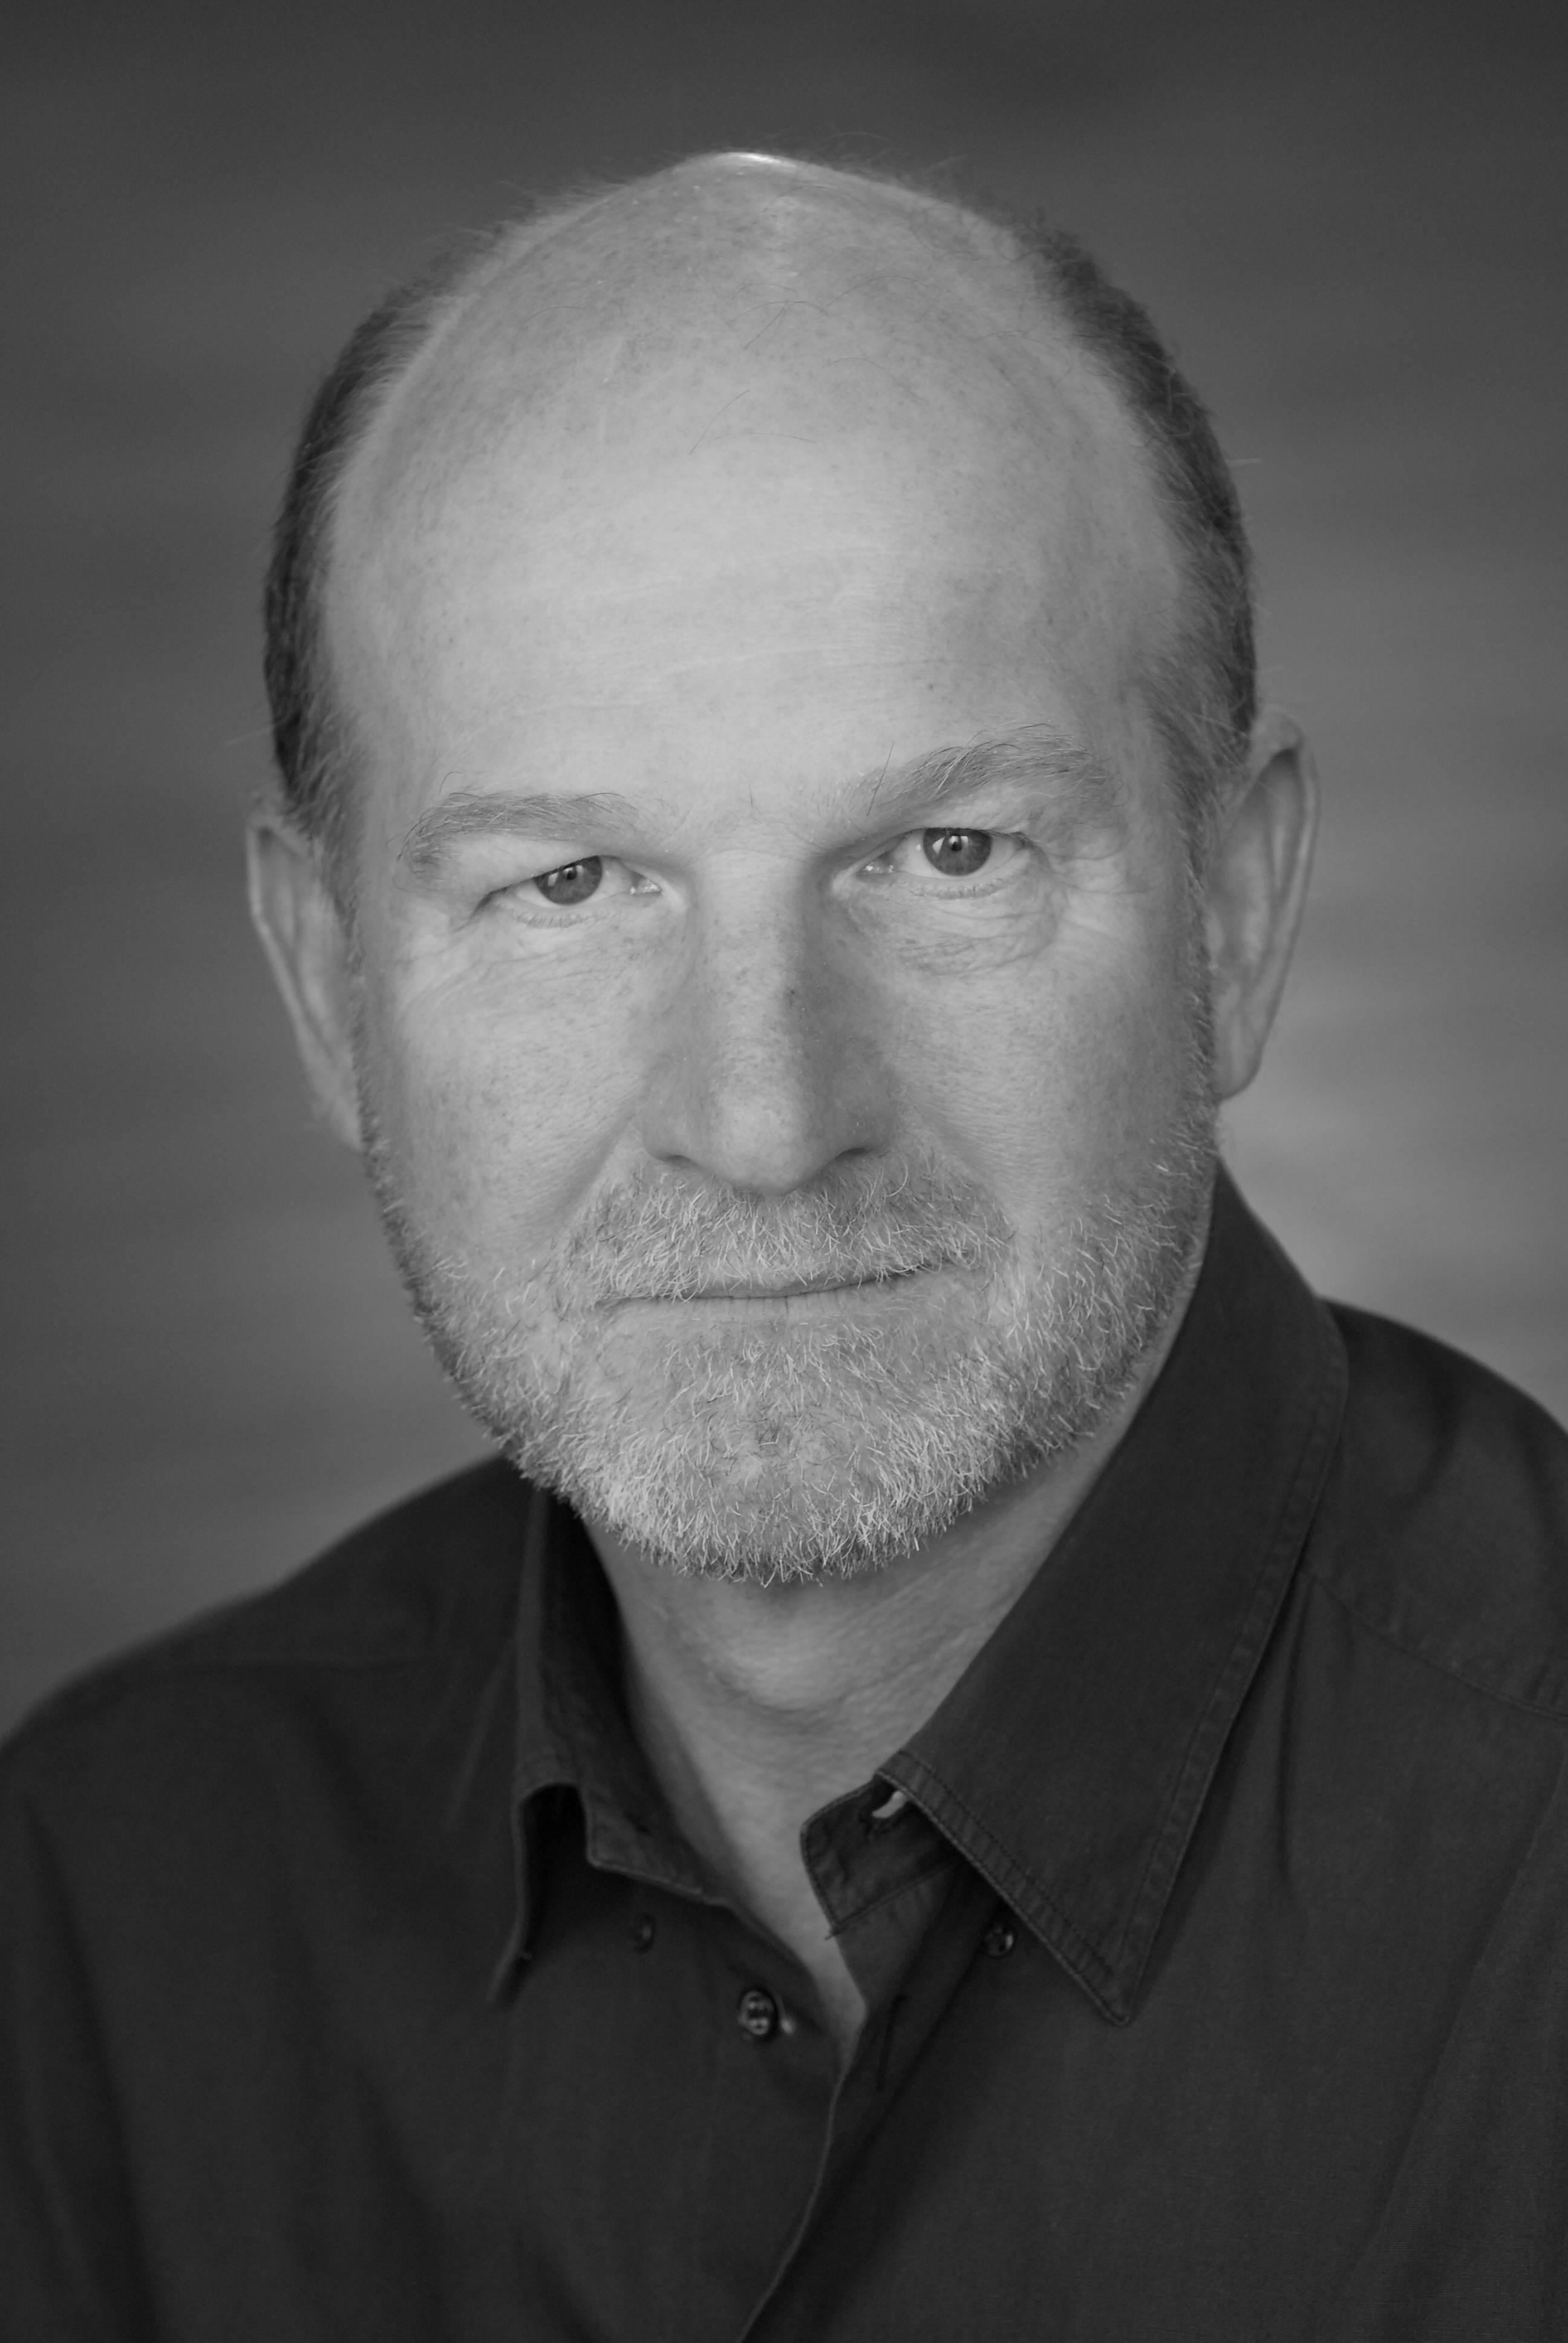 Leof Kingsford-Smith